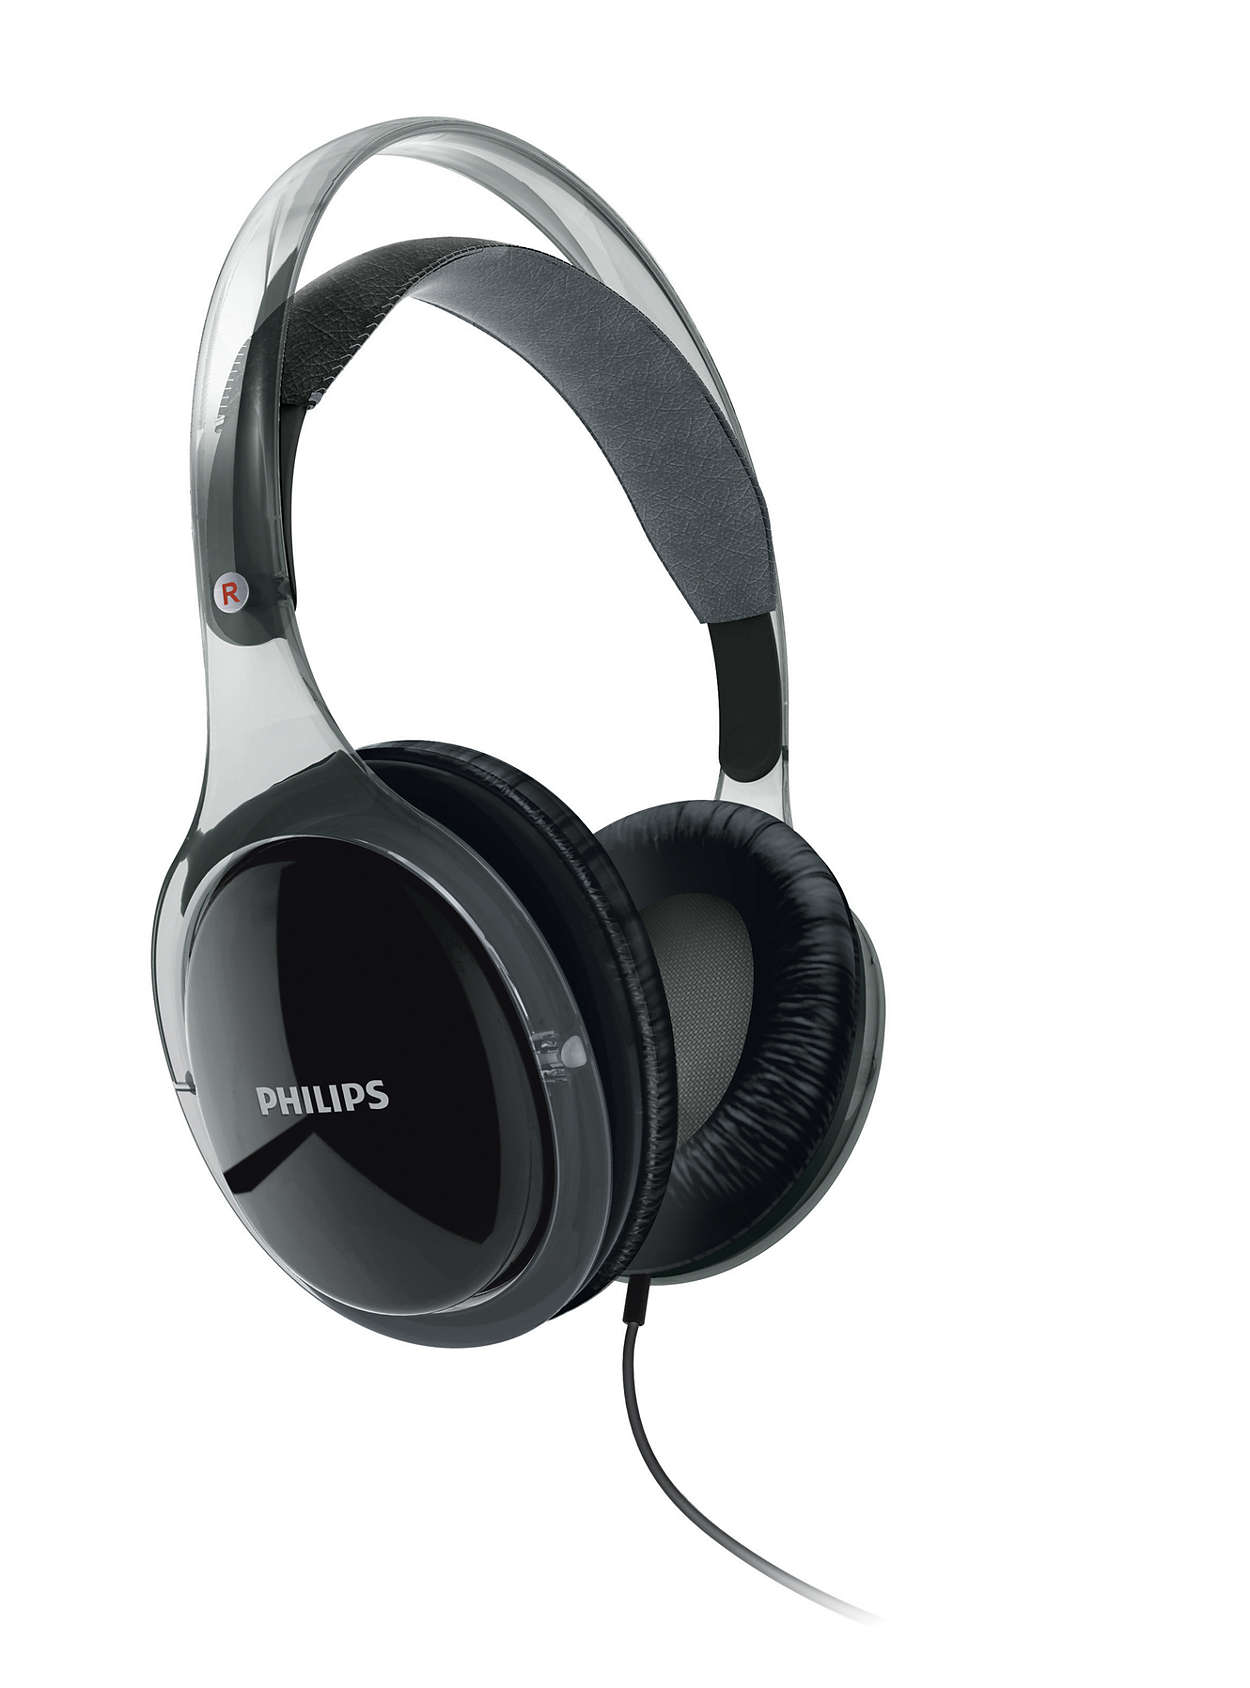 headset f r iphone fernbed mikro shh9567 10 philips. Black Bedroom Furniture Sets. Home Design Ideas